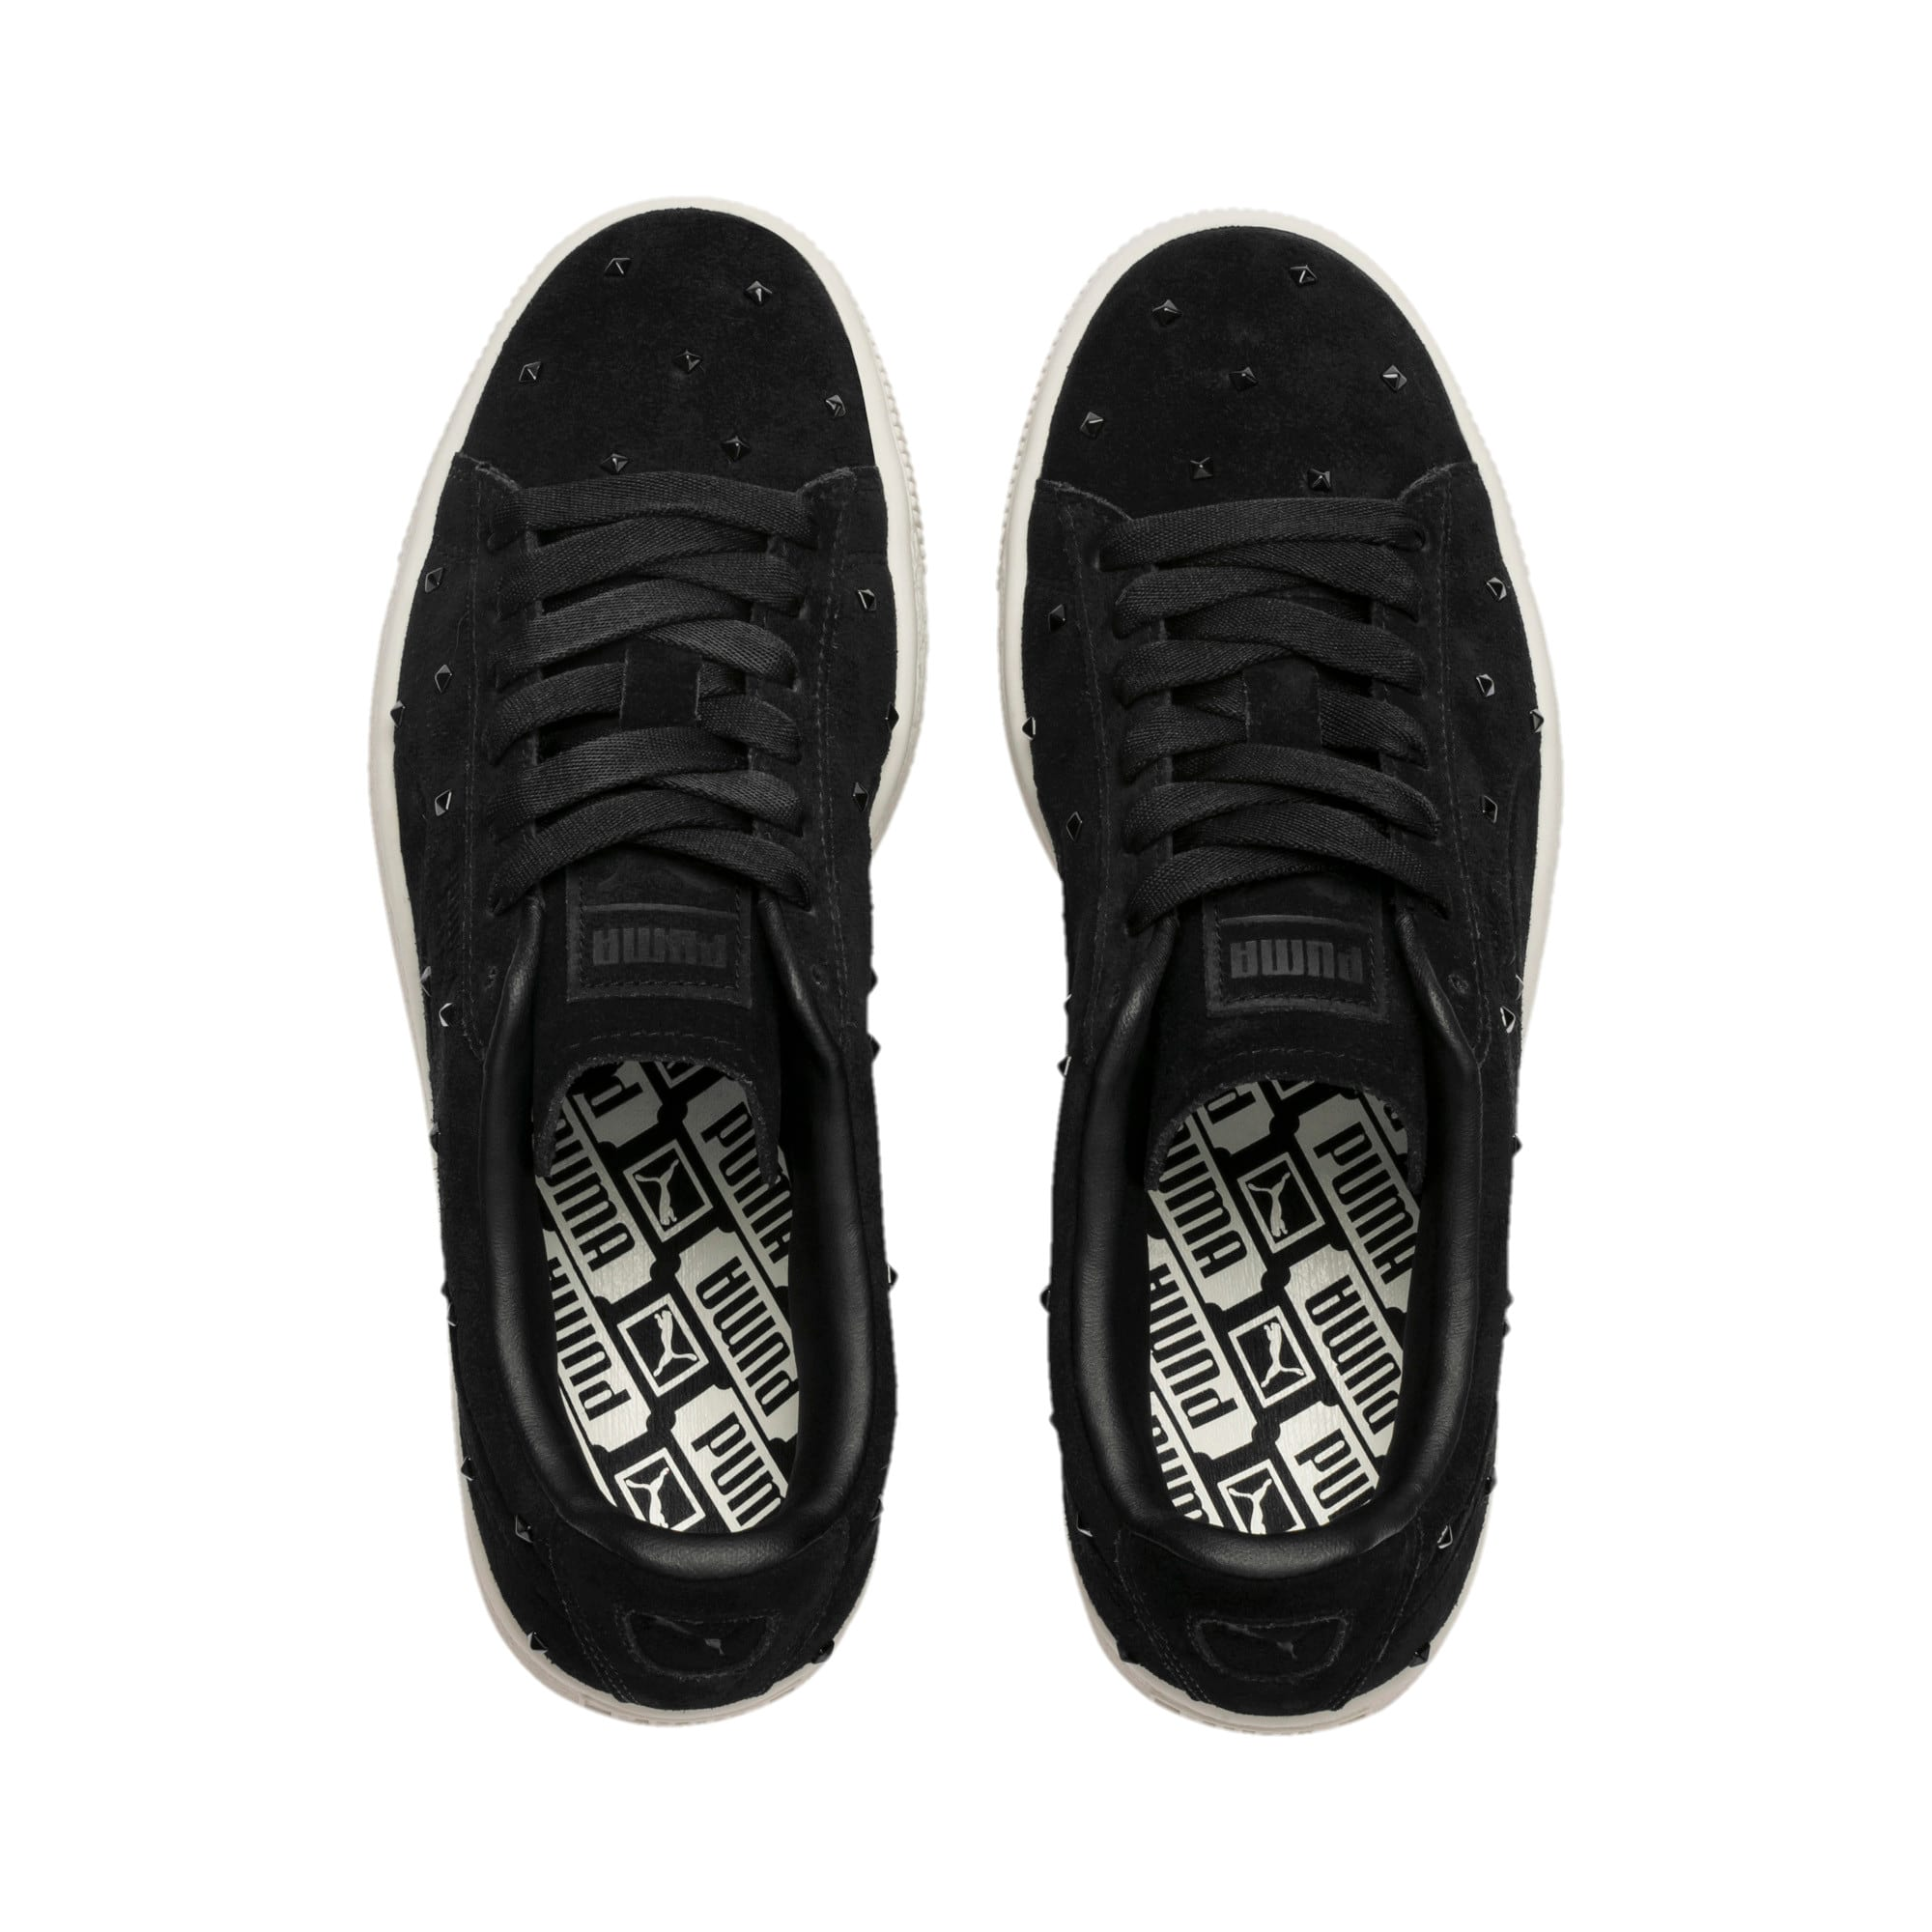 Thumbnail 7 of Suede Studs Damen Sneaker, Puma Black-Marshmallow, medium